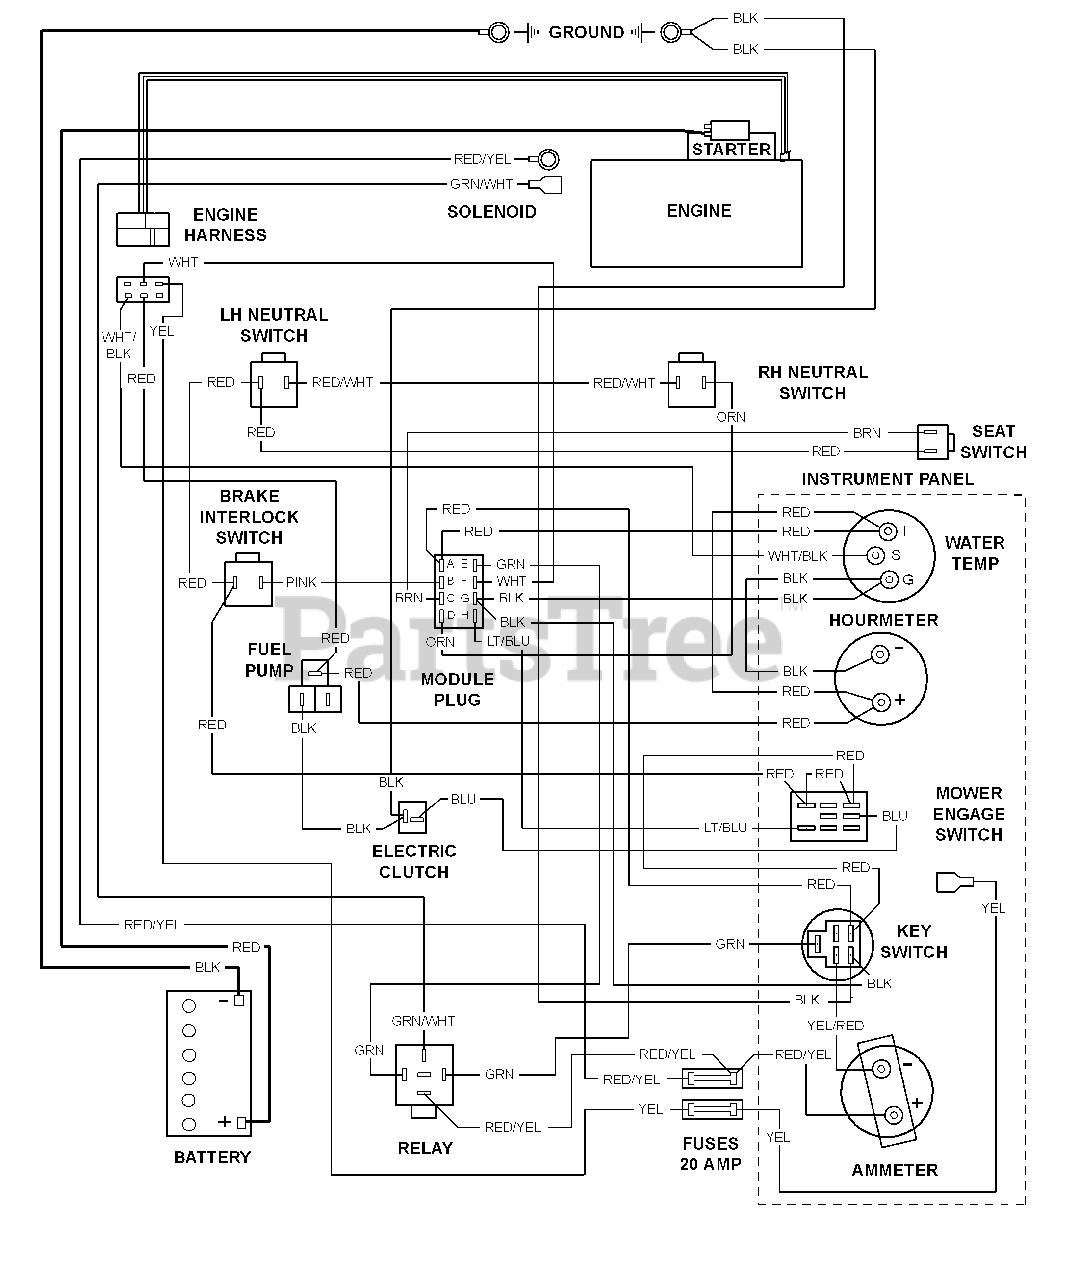 Kawasaki Scag Turf Tiger Wiring Diagram - Wiring Diagram And bite-square -  bite-square.worldwideitaly.it | Turf Tiger Pto Switch Wiring Diagram |  | bite-square.worldwideitaly.it